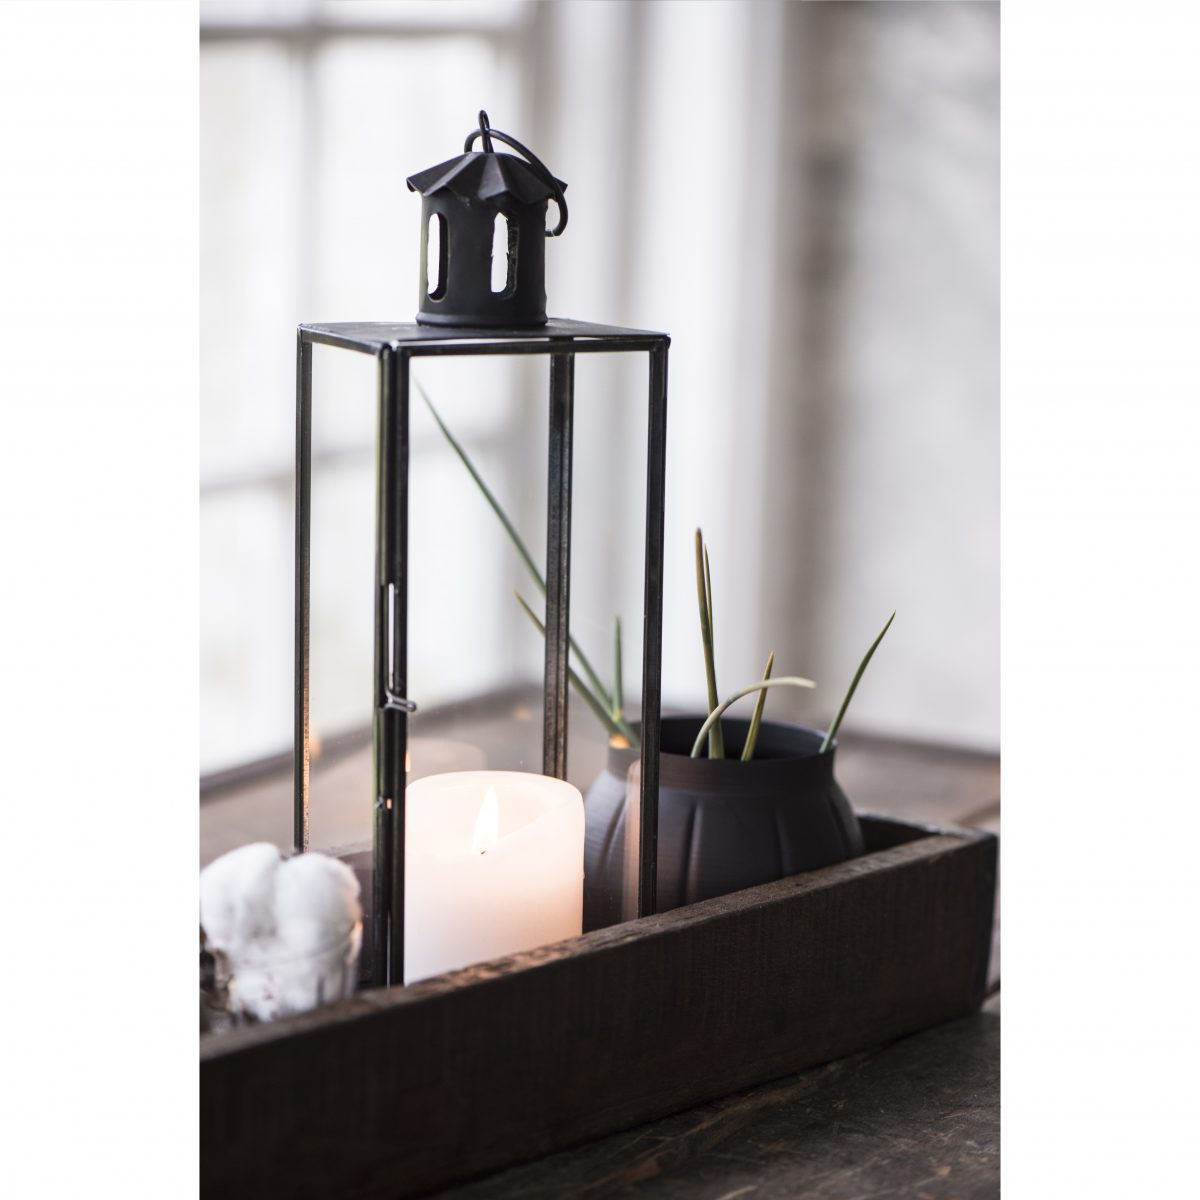 Black Medium Straight Sides Hanging Lantern Pillar Candle Holder Ib Laursen